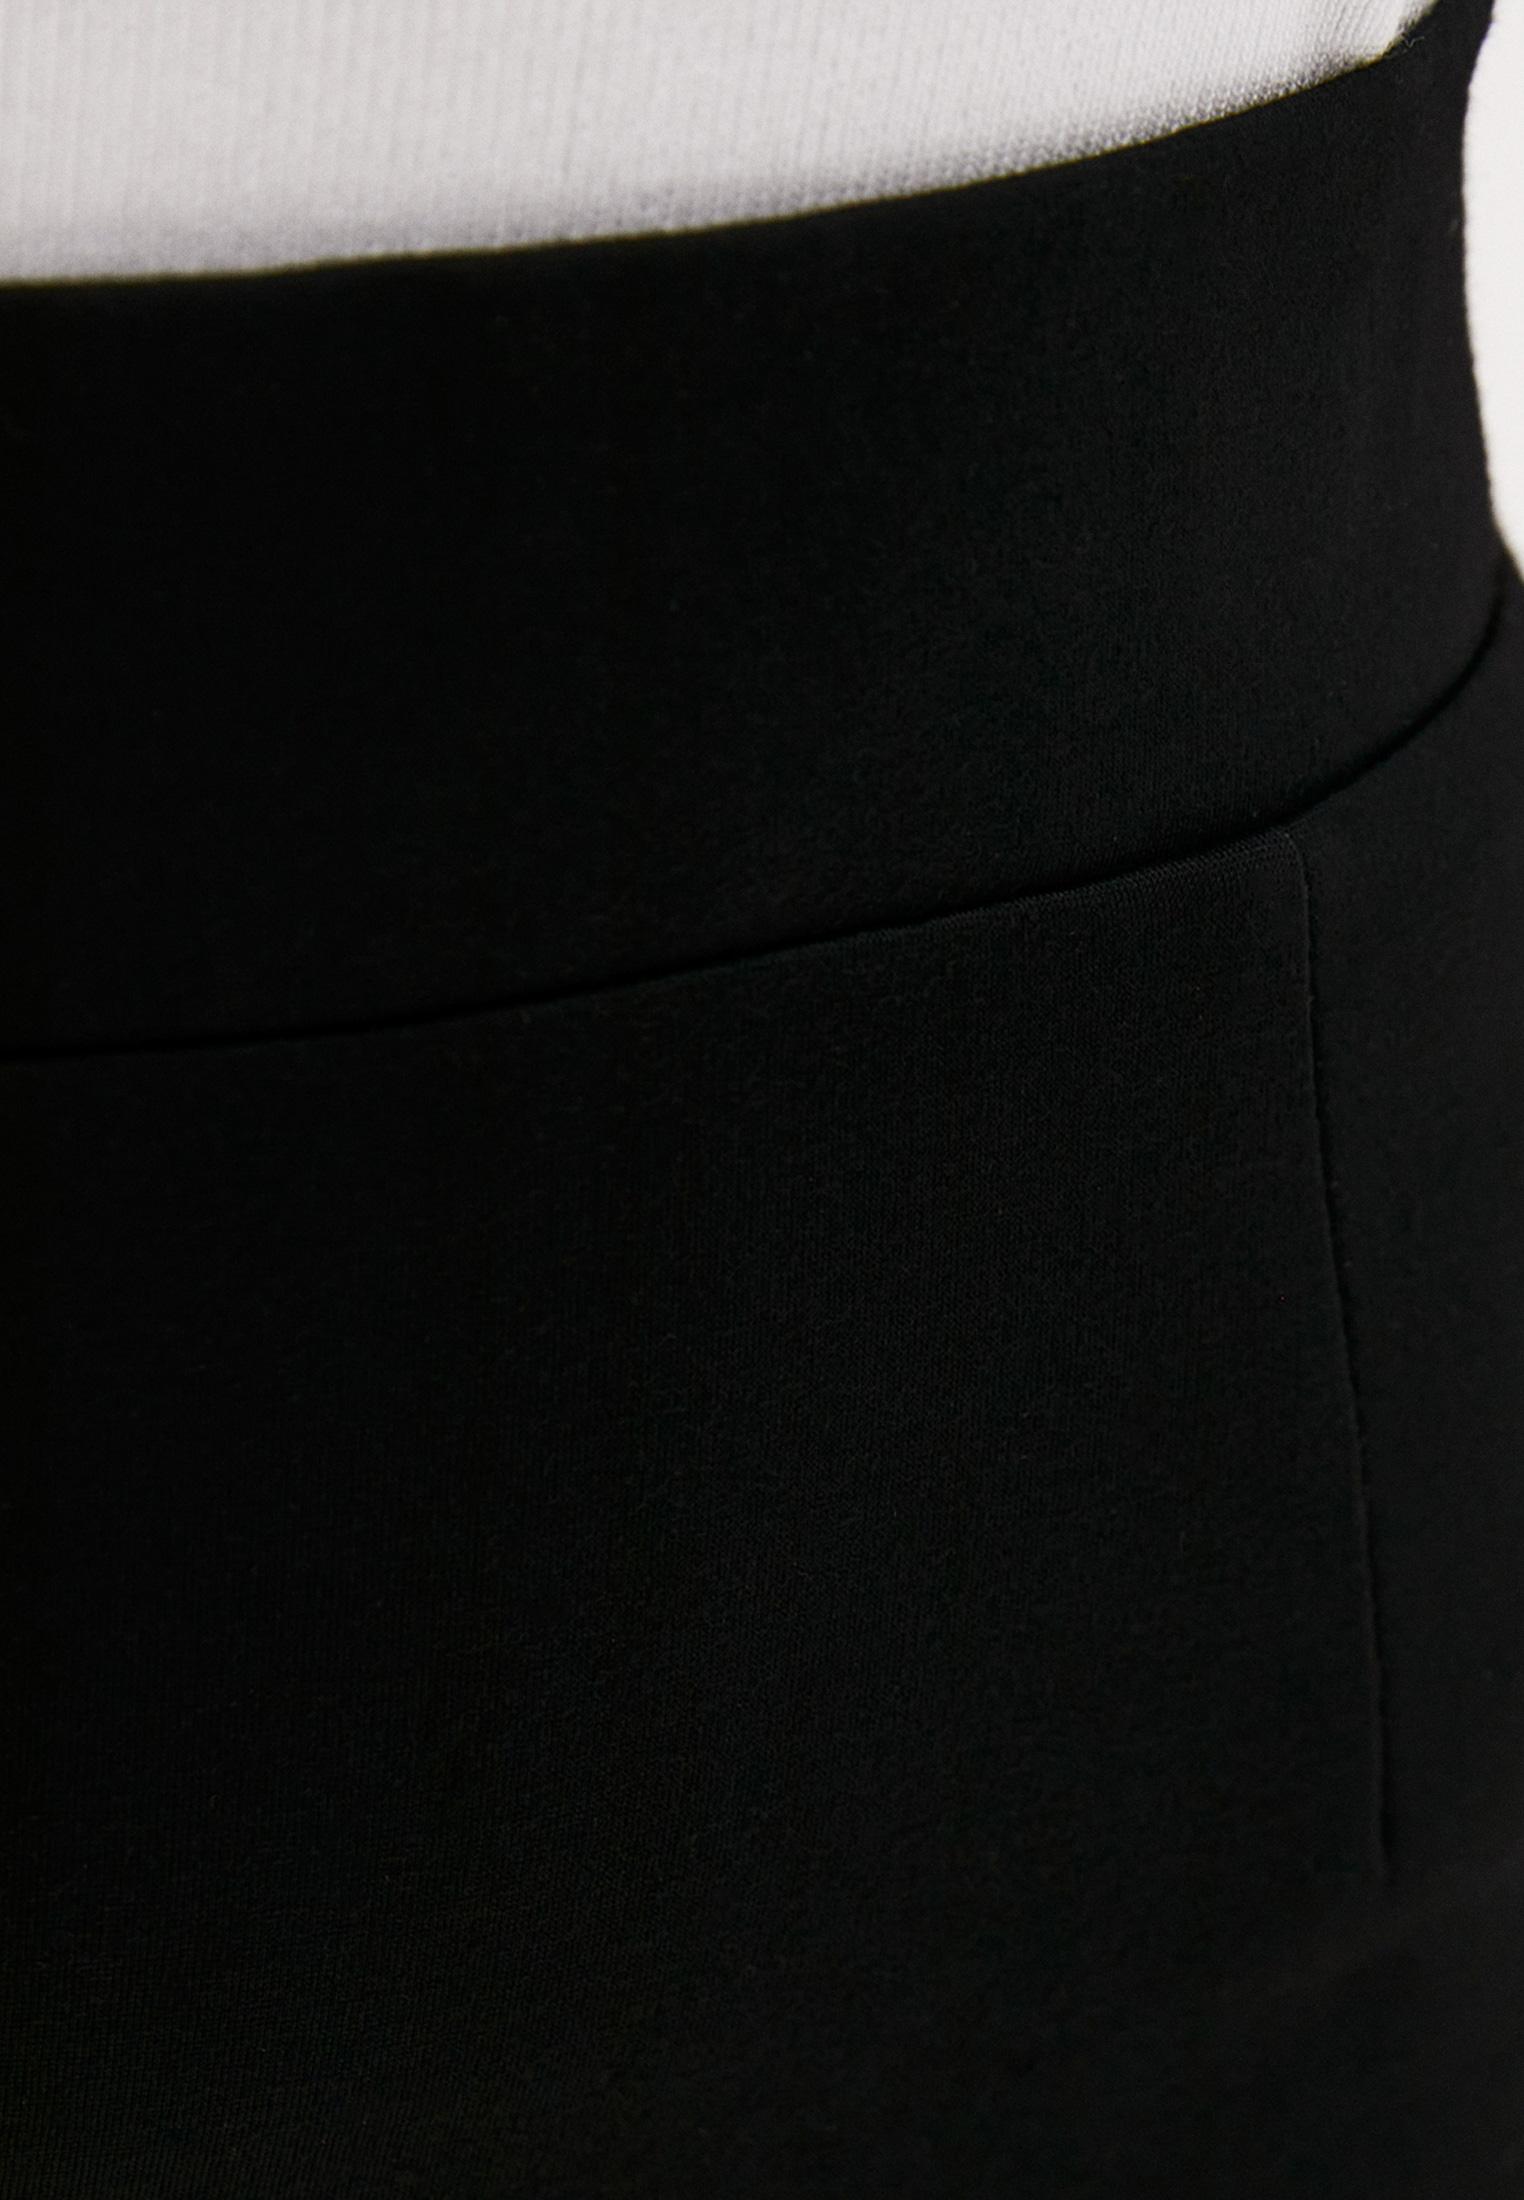 Узкая юбка Toku Tino TT8518025/: изображение 4